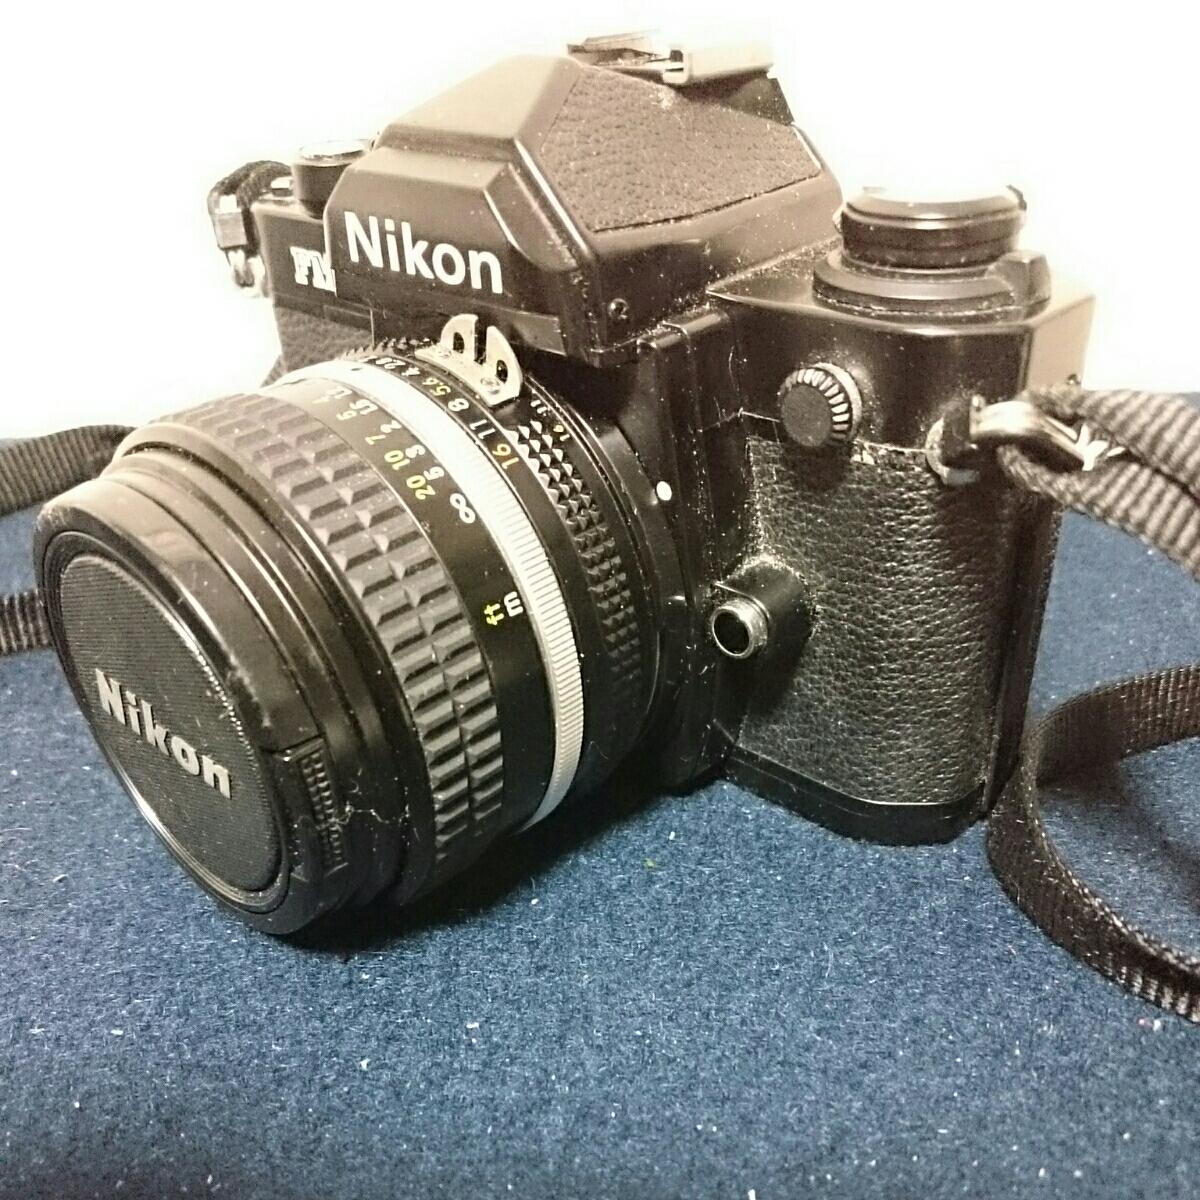 Nikon FM2 ブラックボディ ニコン 一眼レフカメラ 動作未確認 ケース傷みあり_画像3